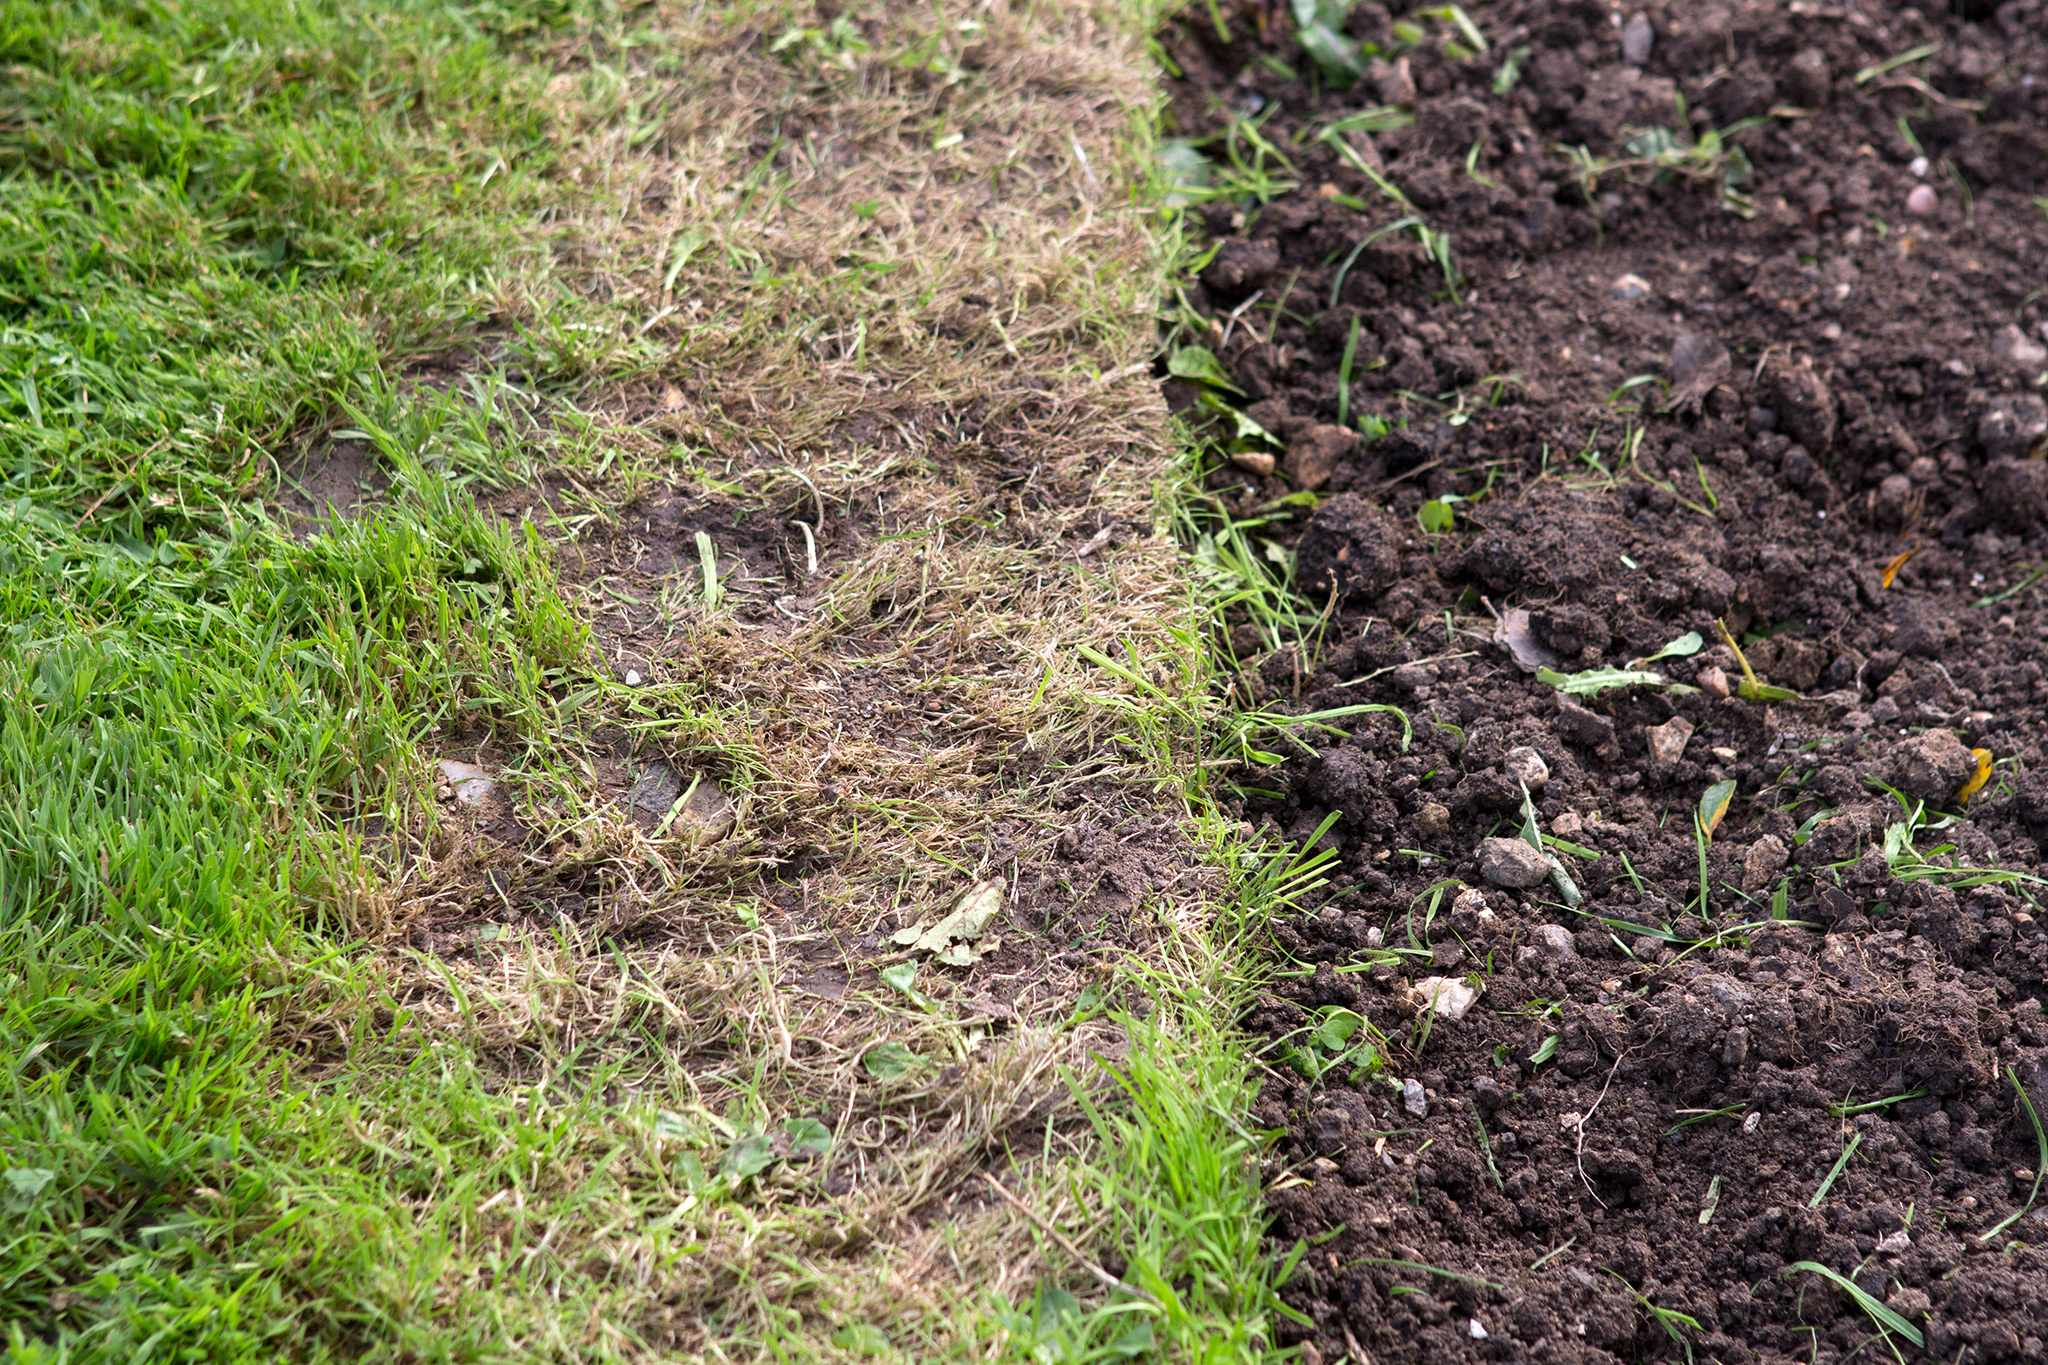 A lawn edge that needs repairing